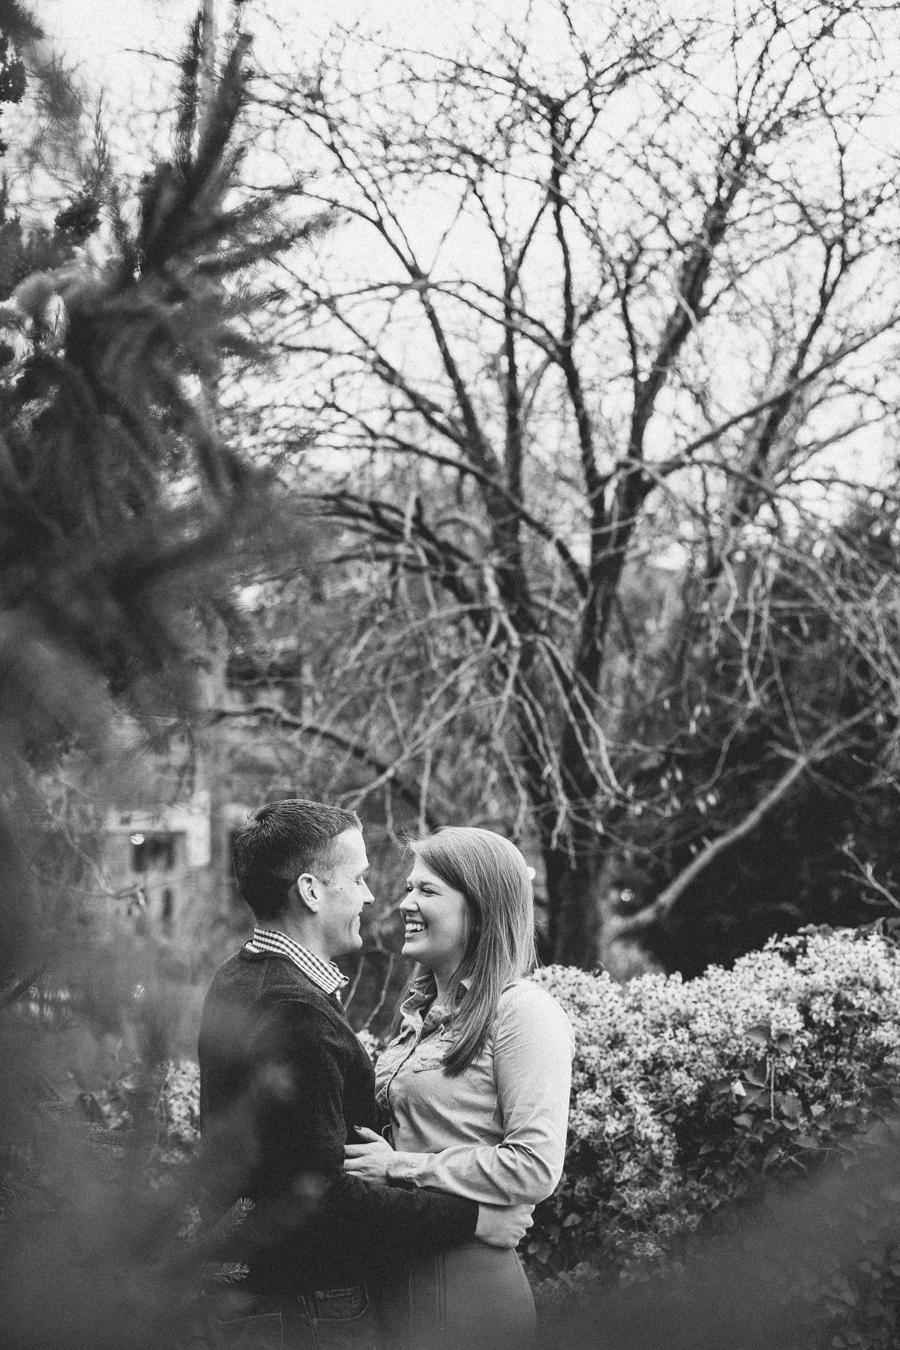 Lailee-Michael-Engagement-Blog-1-30.jpg